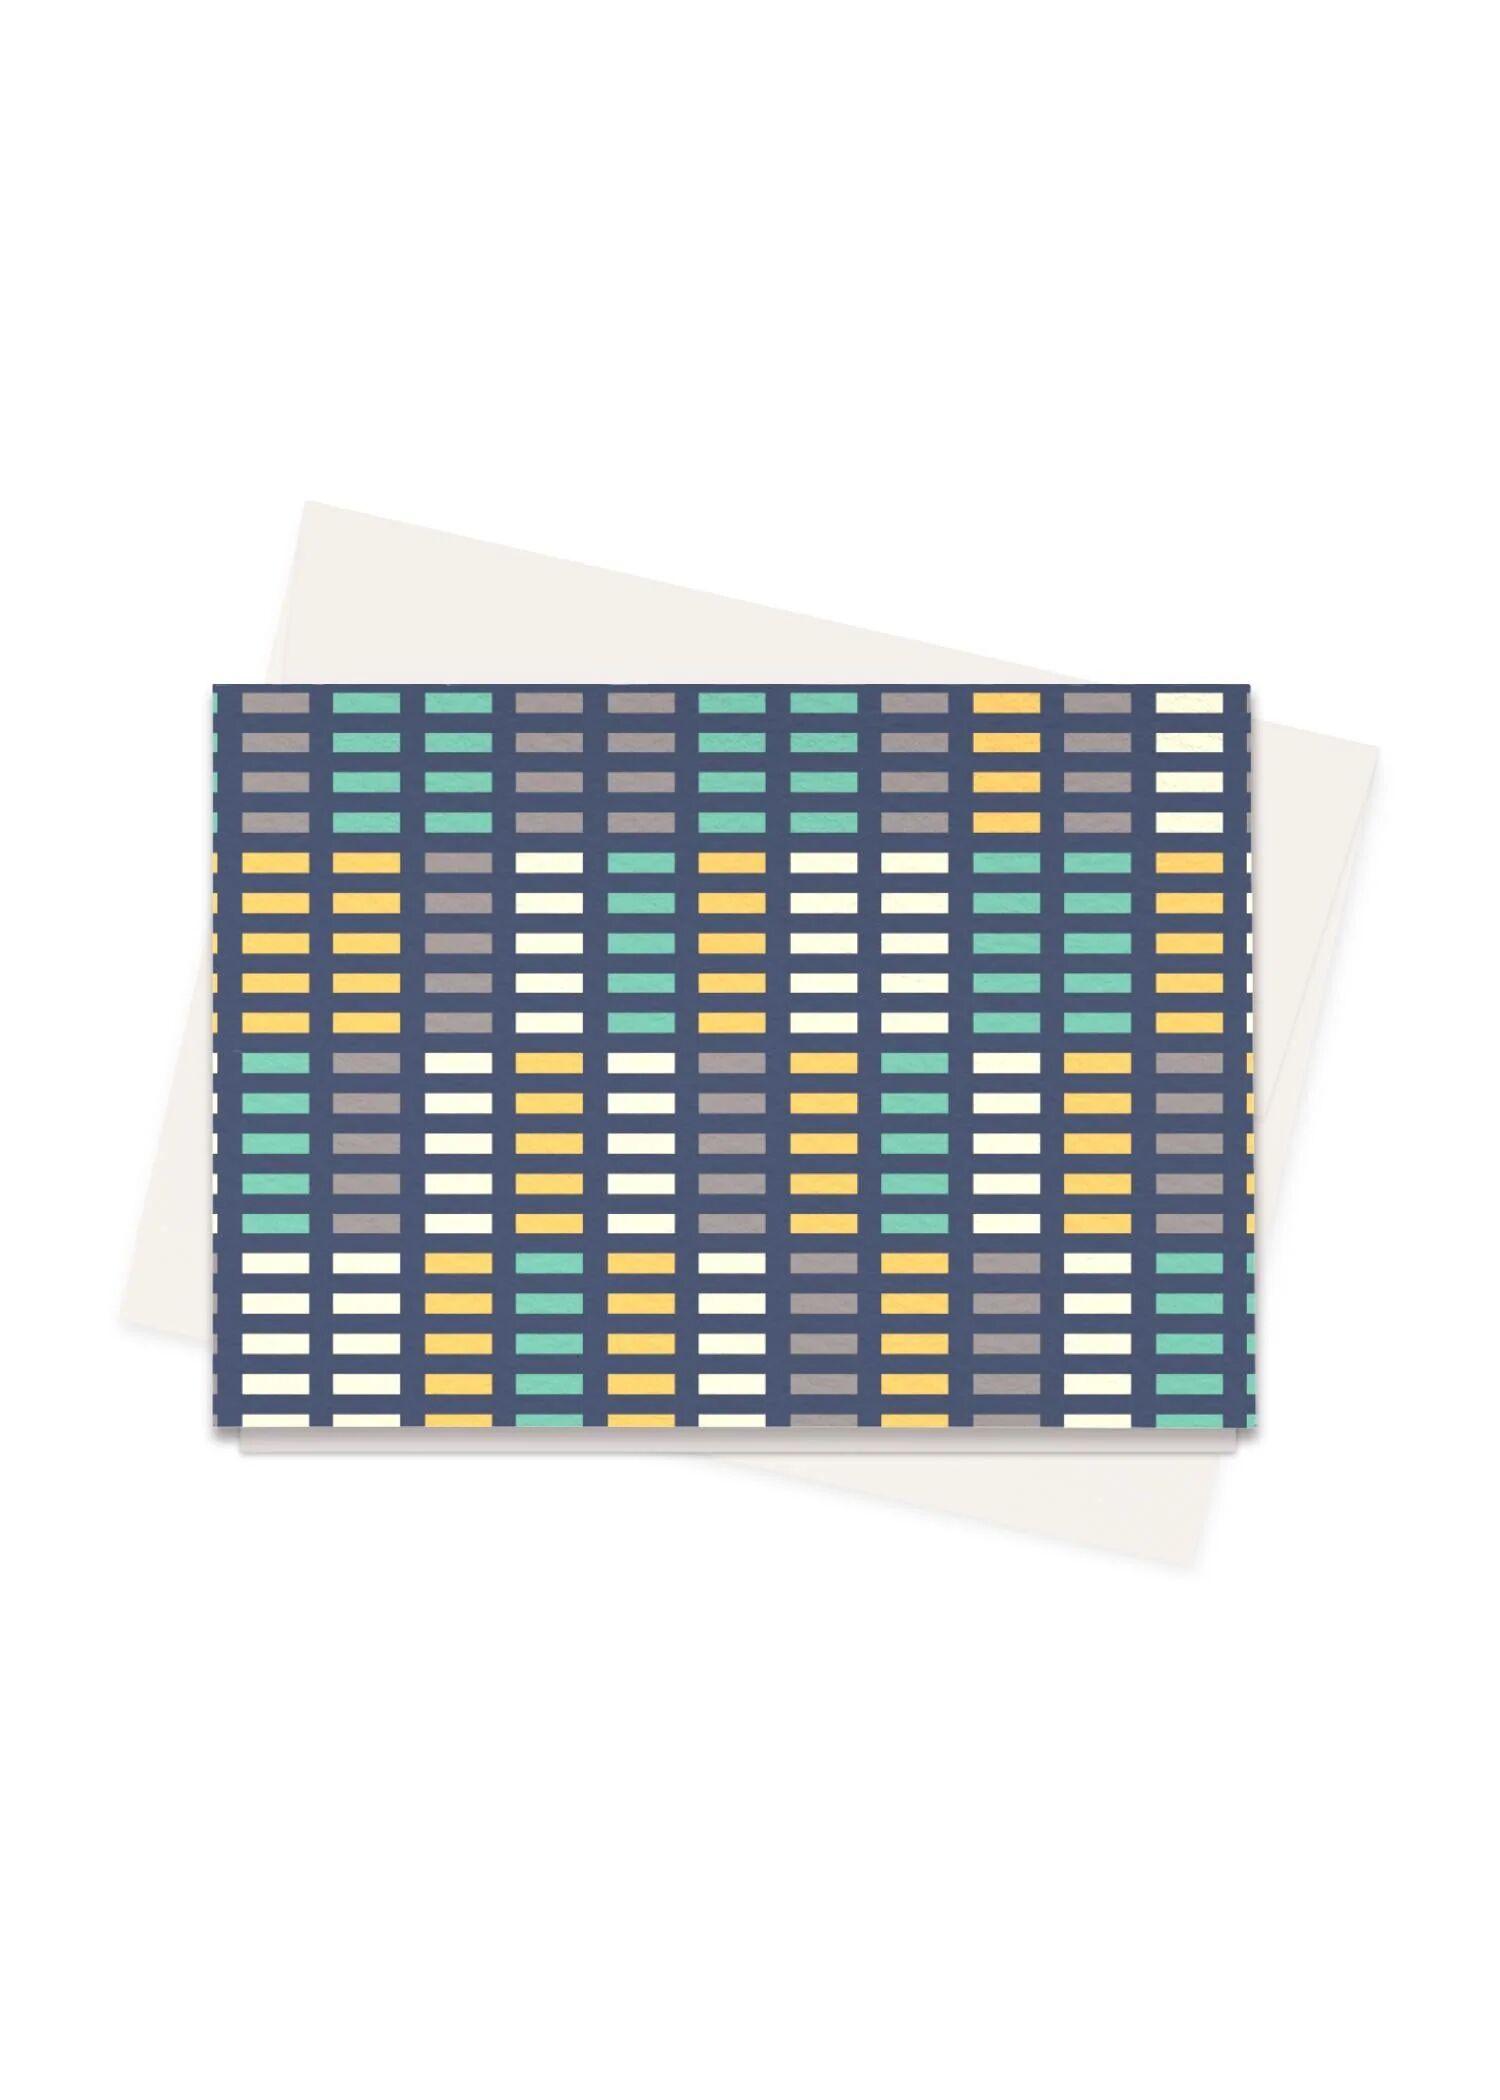 VIDA Greeting Cards Set - Music Equalizer by VIDA Original Artist  - Size: Set of 16